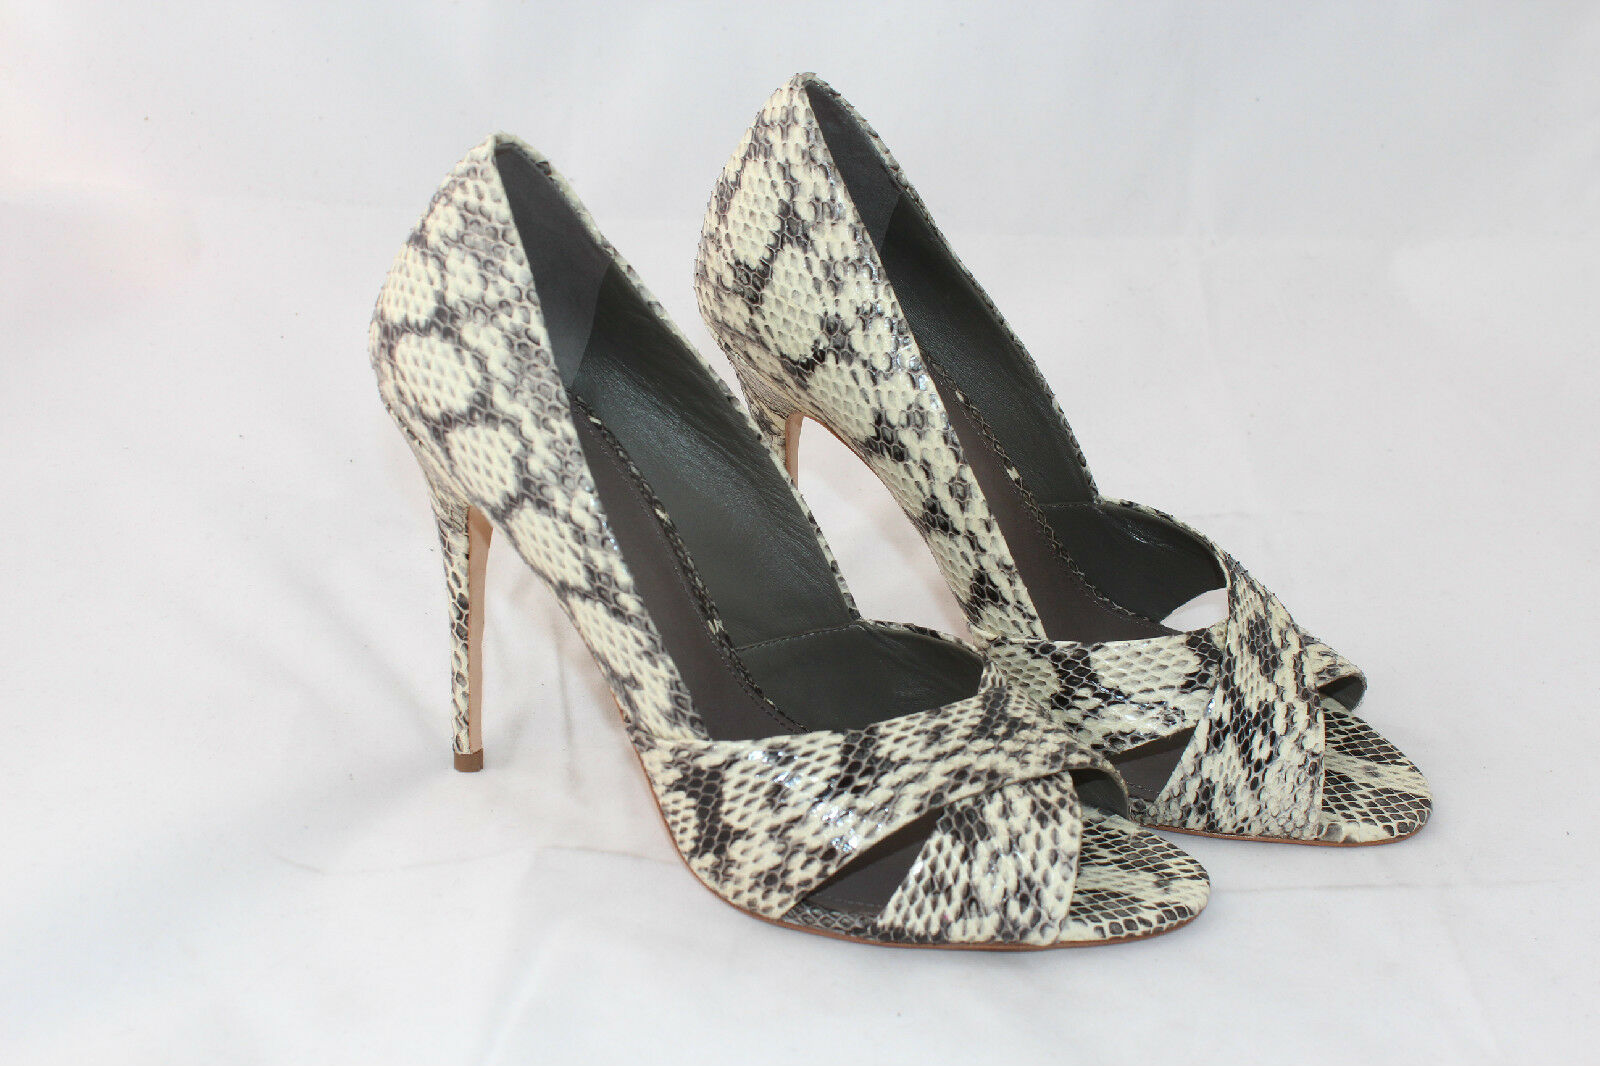 350 TORY BURCH Amira Roccia Snakeskin High Heels Leather 9.5M schuhe Pumps (O29)